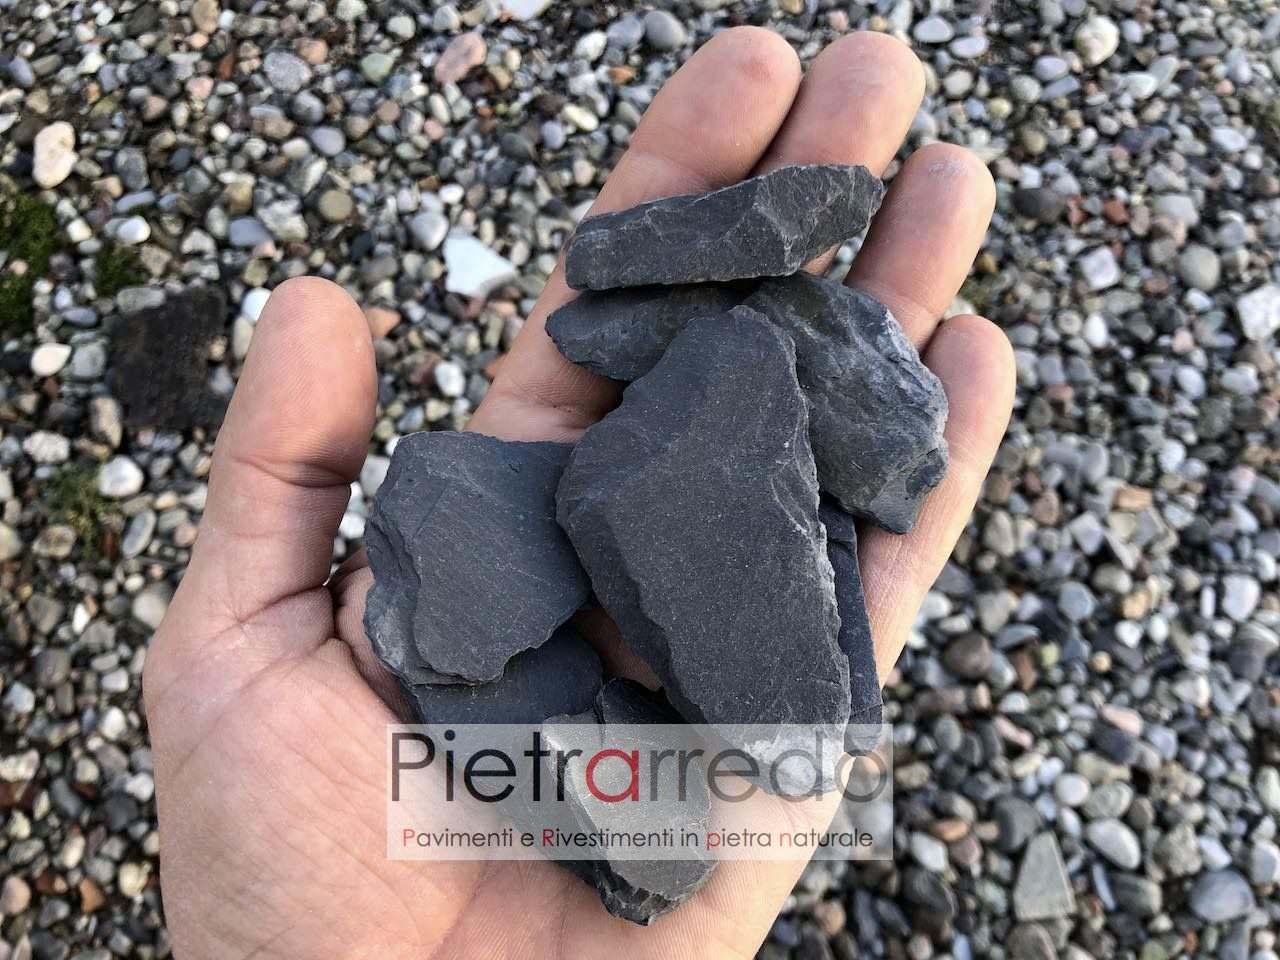 costo sacco ardesia nera scaglie nere assoluto gravel slate blak stone pietrarredo costi arredo giardino